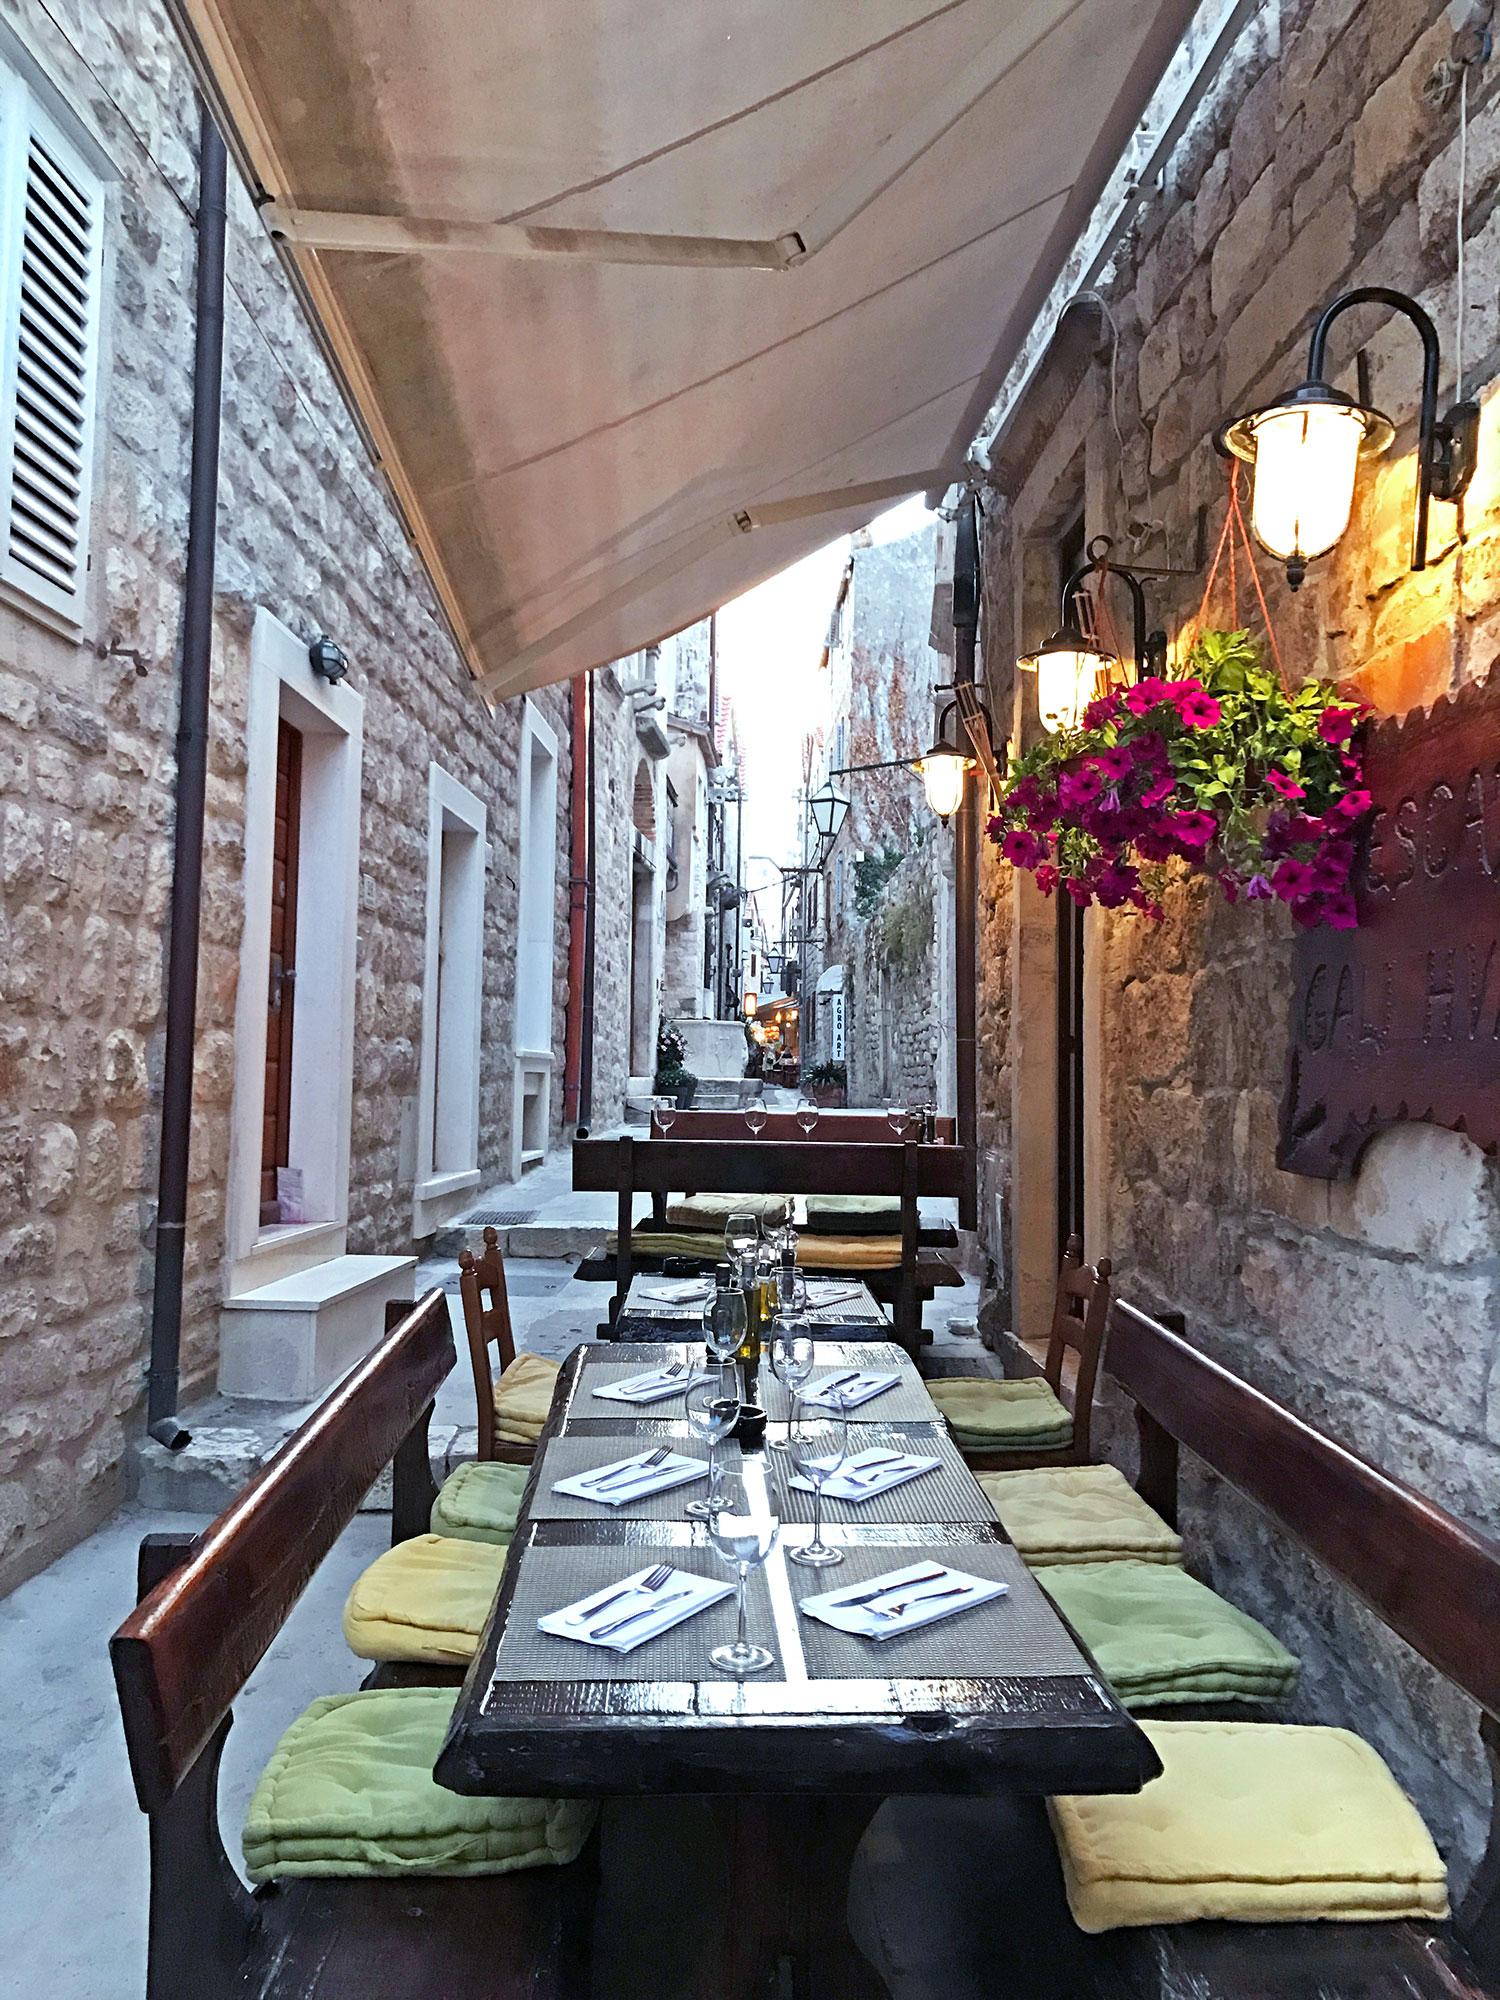 Hvar-Croatia-alley.jpg